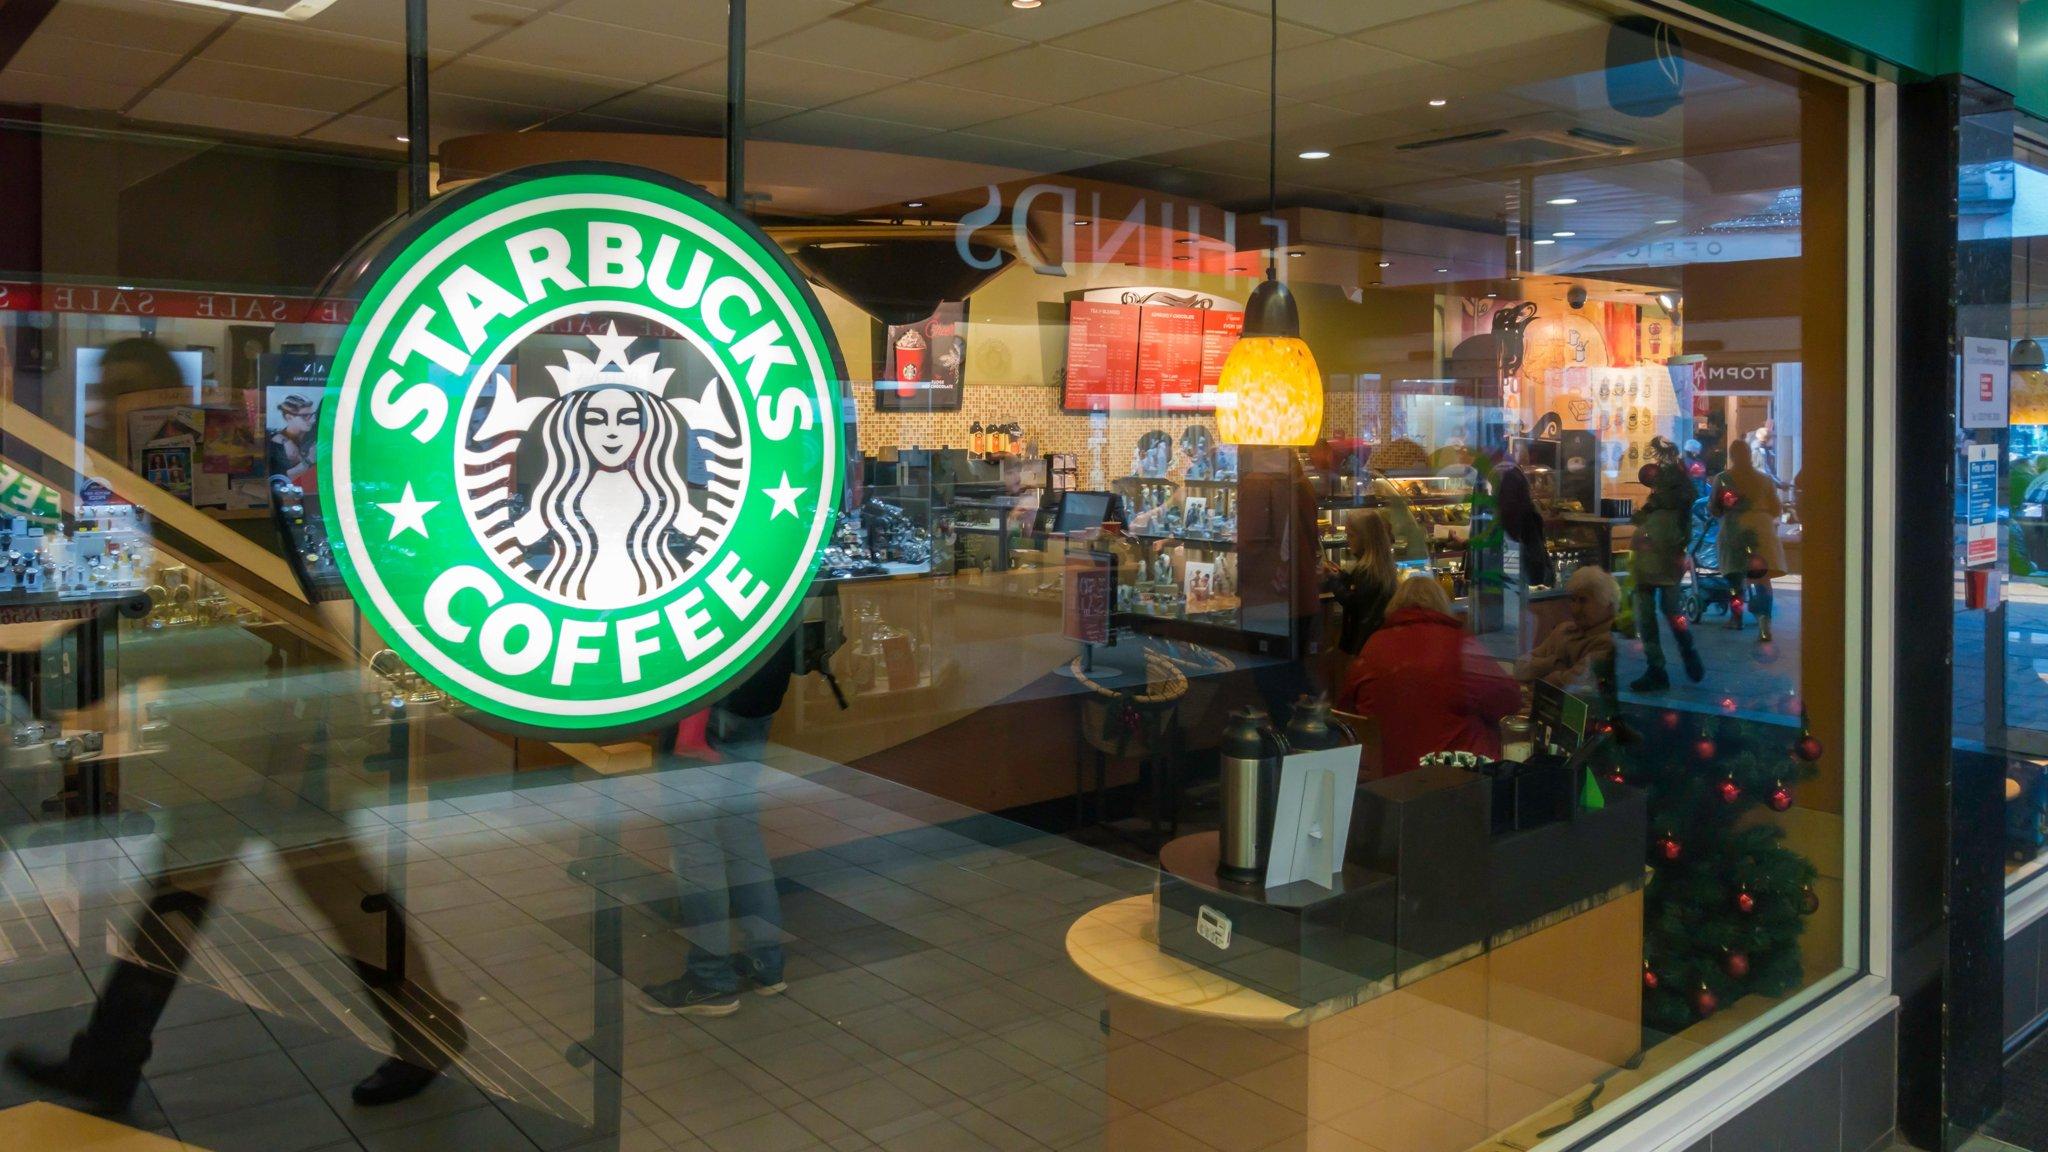 Starbucks' European unit paid 2 8% UK tax last year